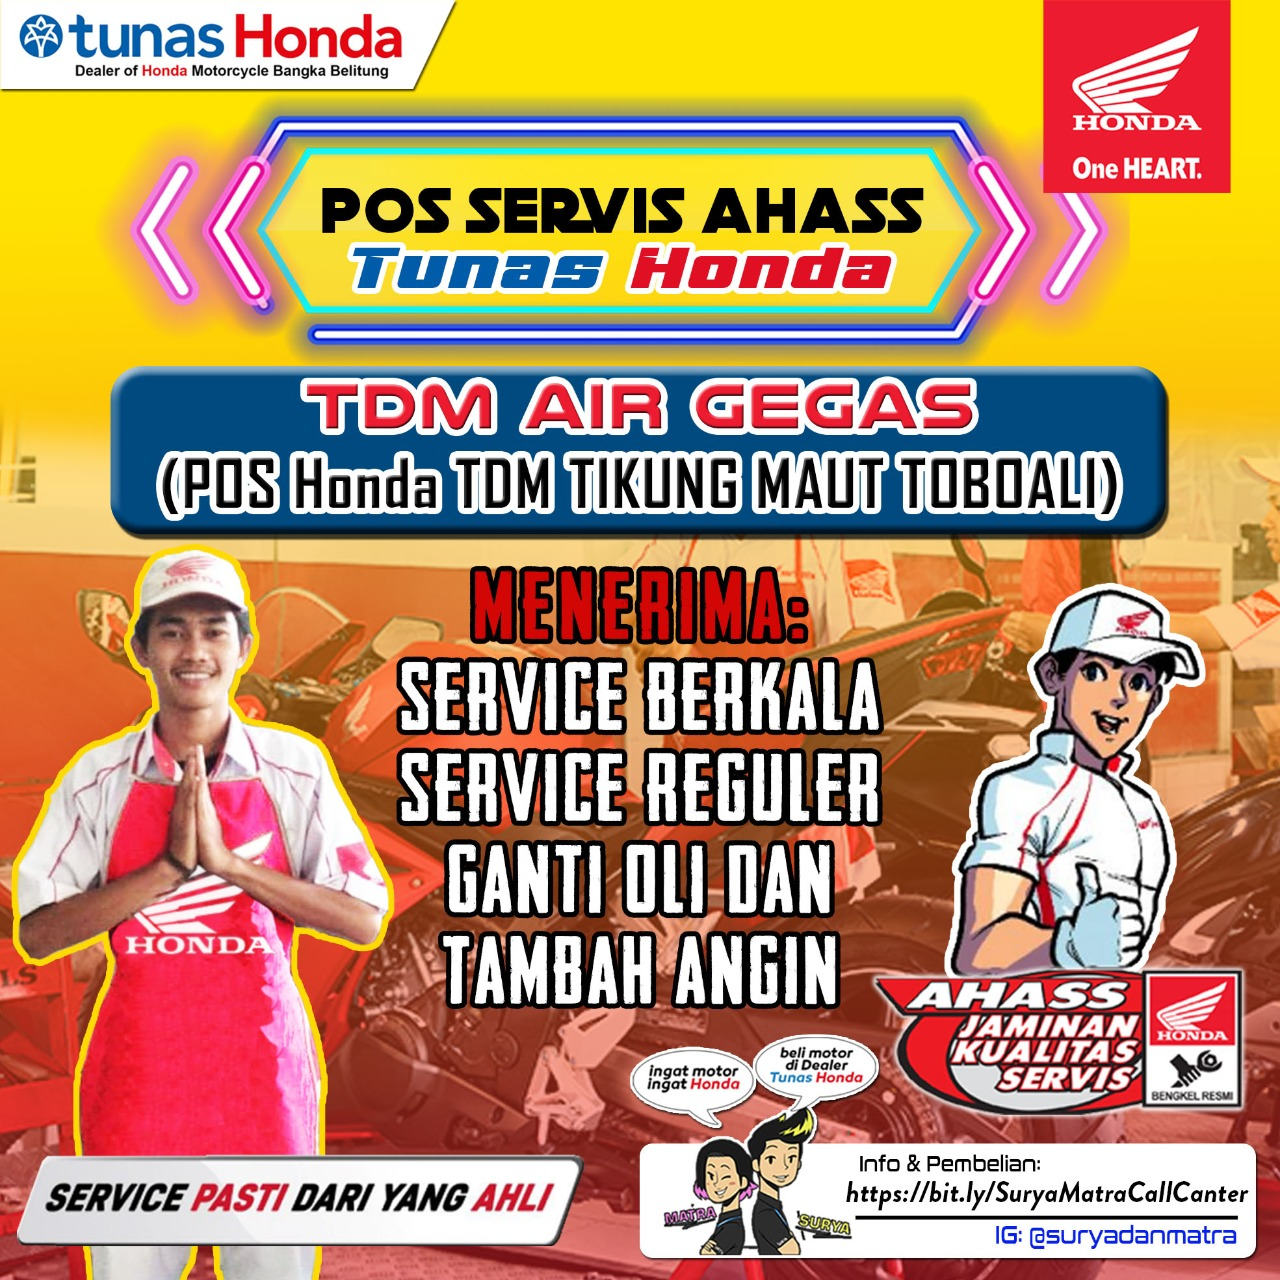 Honda TDM Air Gegas dan Honda TDM Pos Tikung Toboali hadir dengan promo hadiah langsung, baik itu pembelian secara Cash atau pun kredit di bulan Maret 2021.  Hadiah langsung berupa alat elektronik dan Oli sebanyak 2 botol dan Promo ini berlaku untuk semua type Motor Honda.